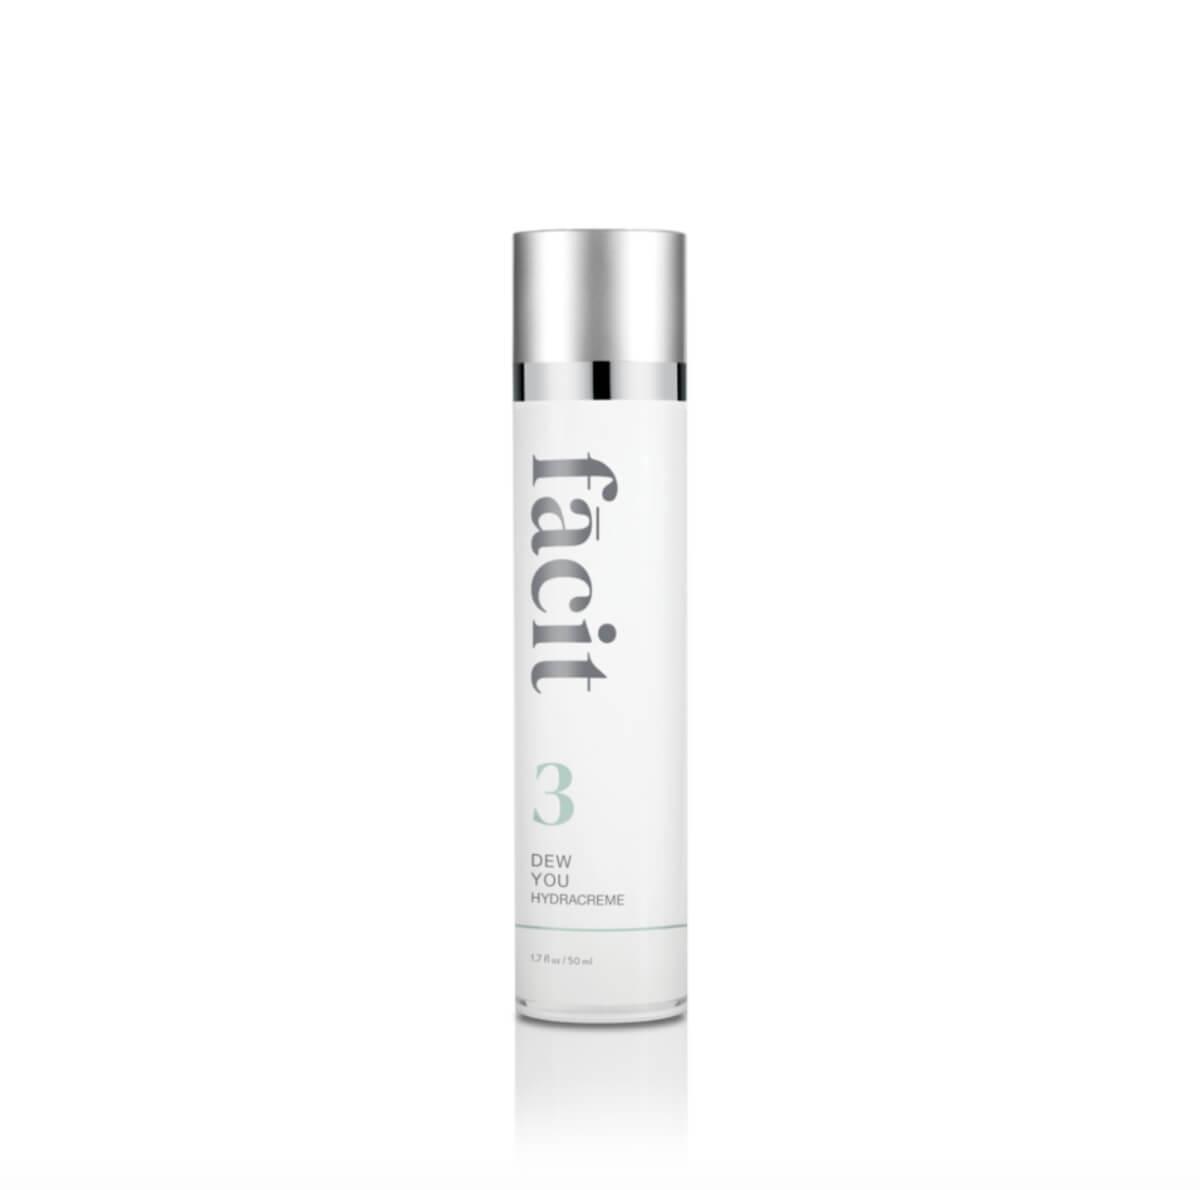 dew-you-hydracreme-facit-050421